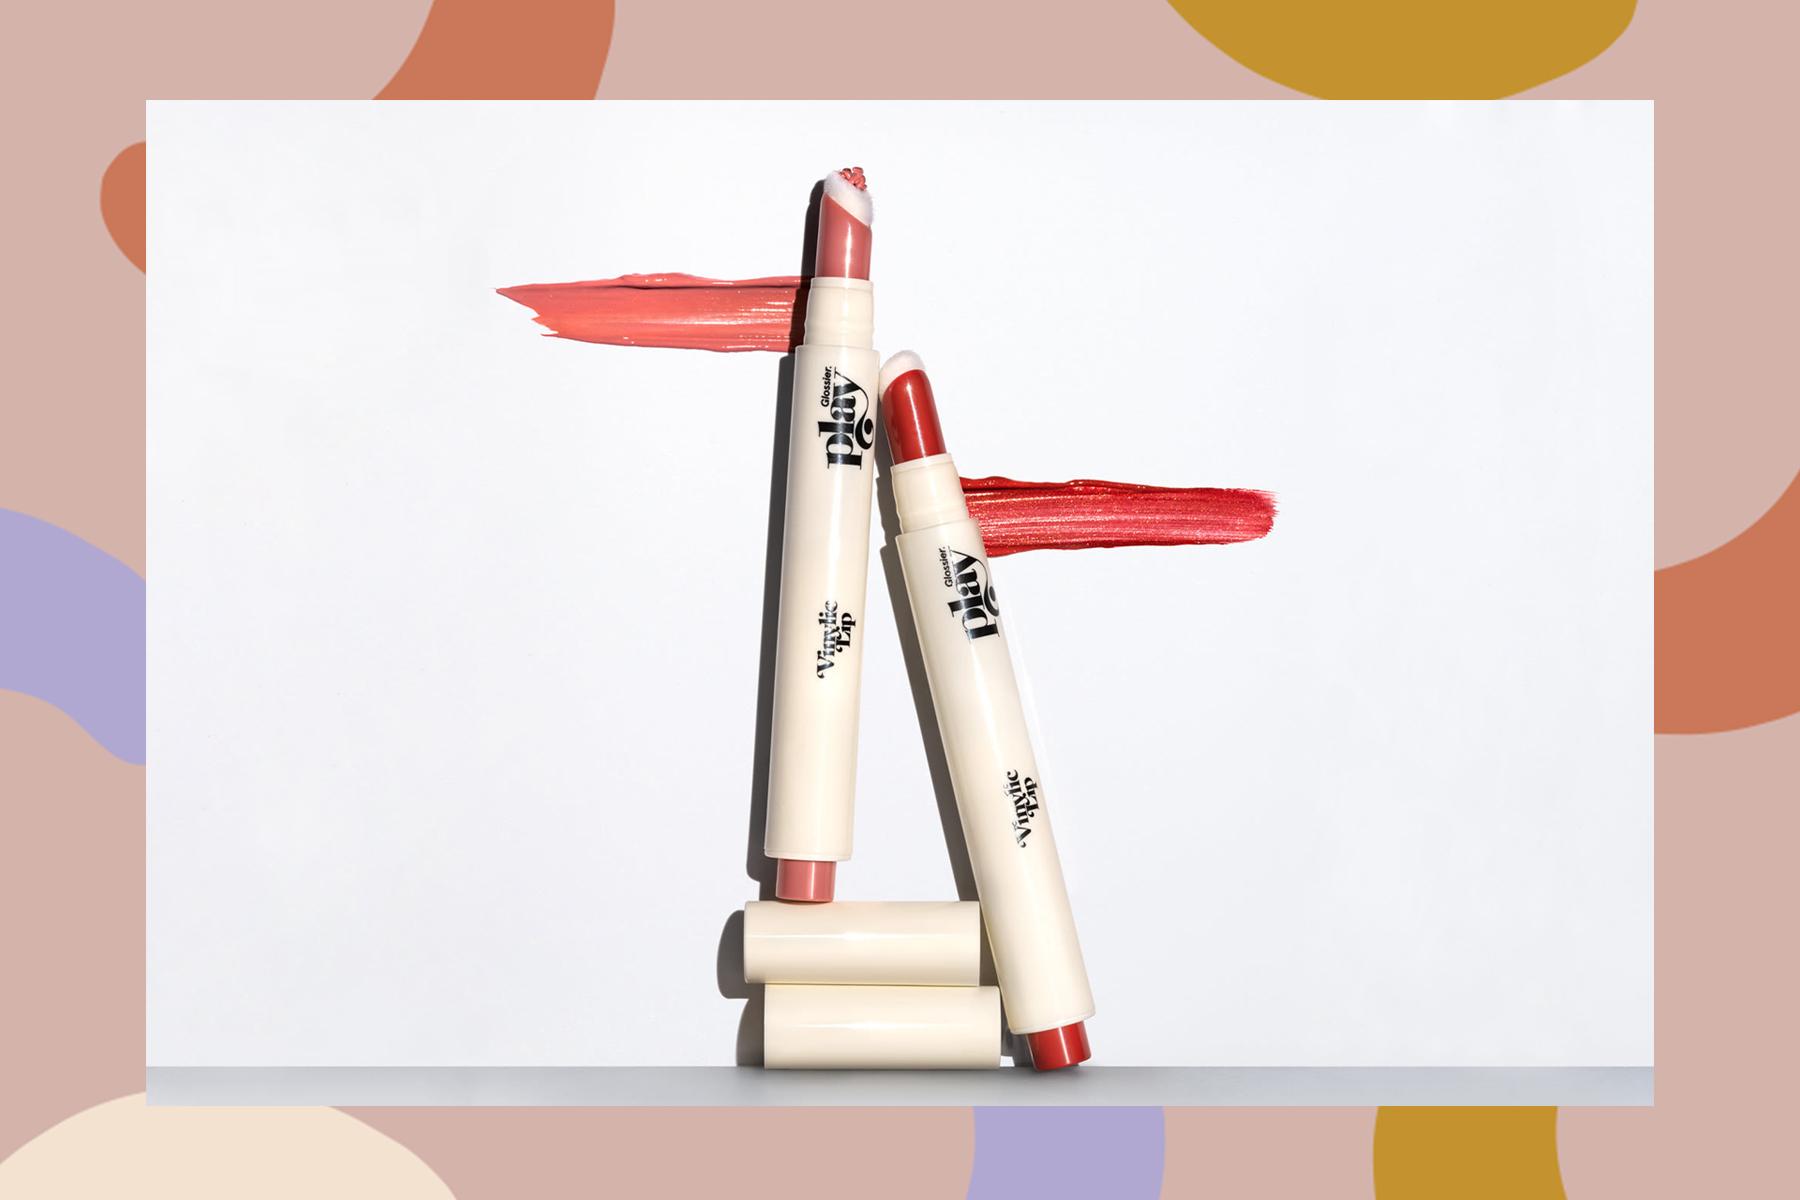 glossier vinylic lip